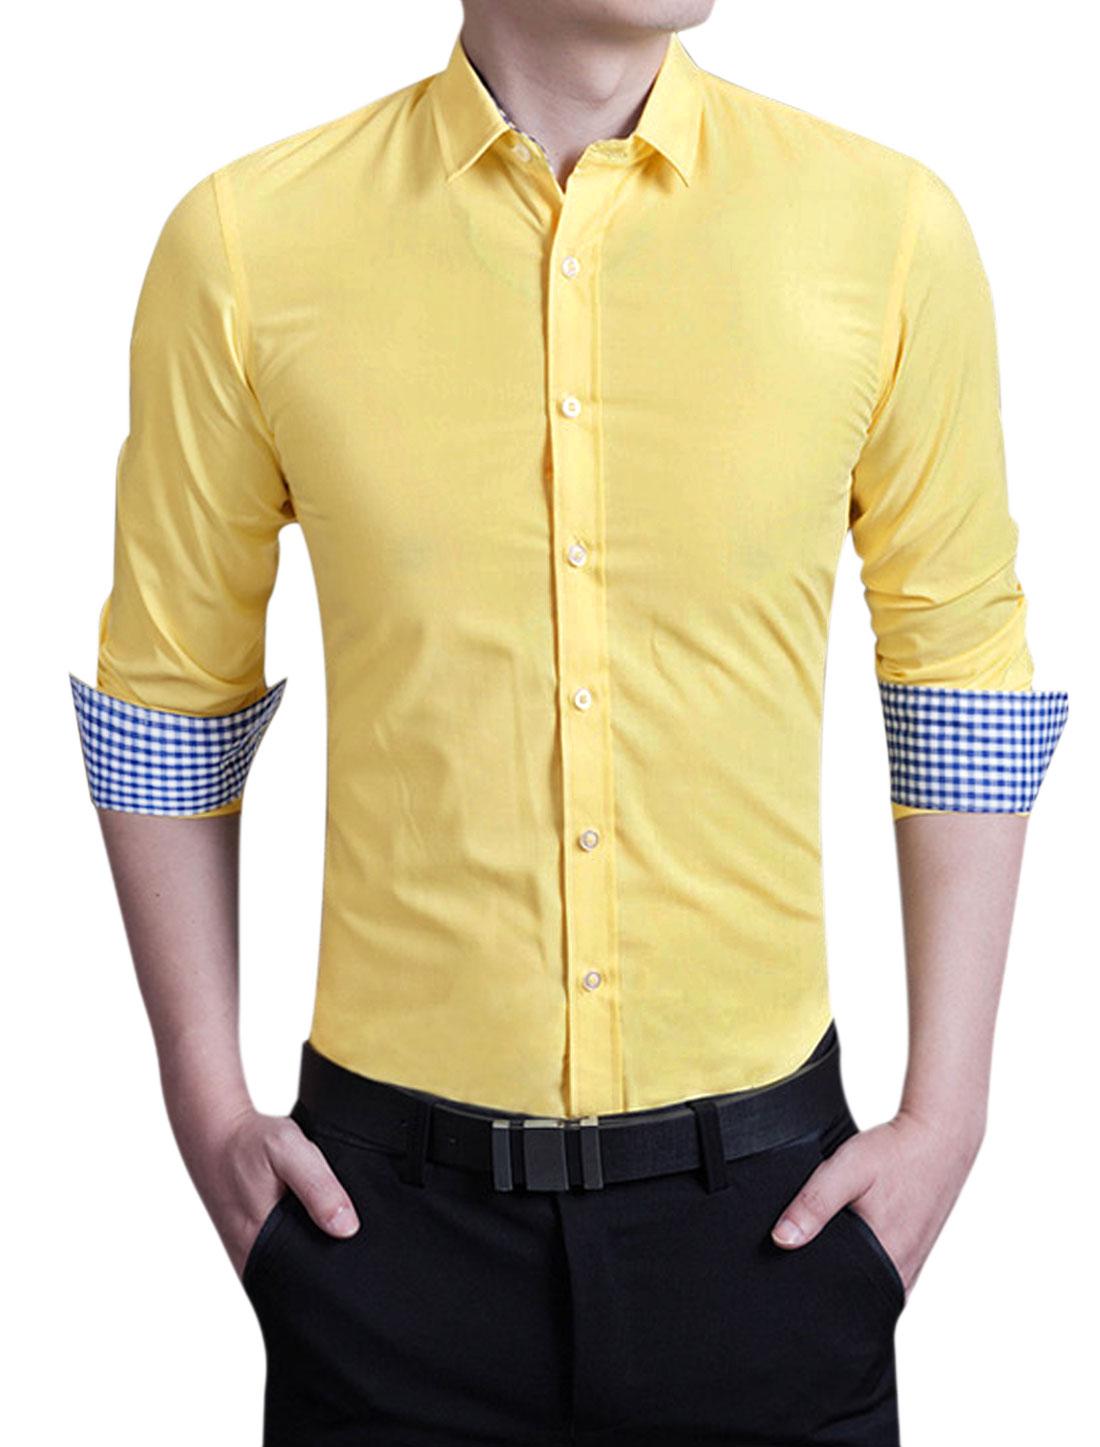 Men Point Collar Round Edge Slim Fit Business Shirt Yellow M